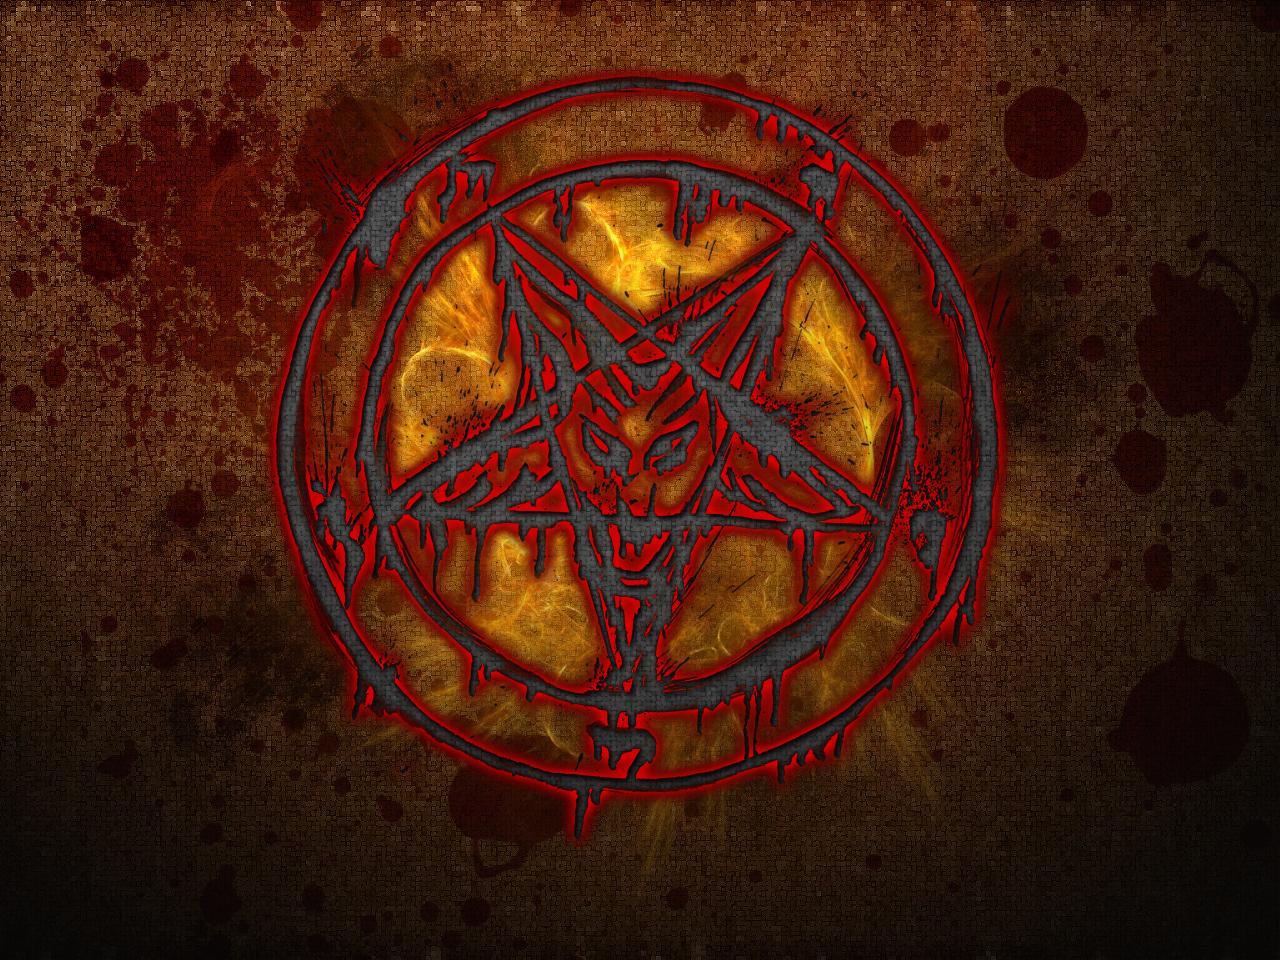 Dark Occult Wallpaper 1280x960 Dark Occult 1280x960